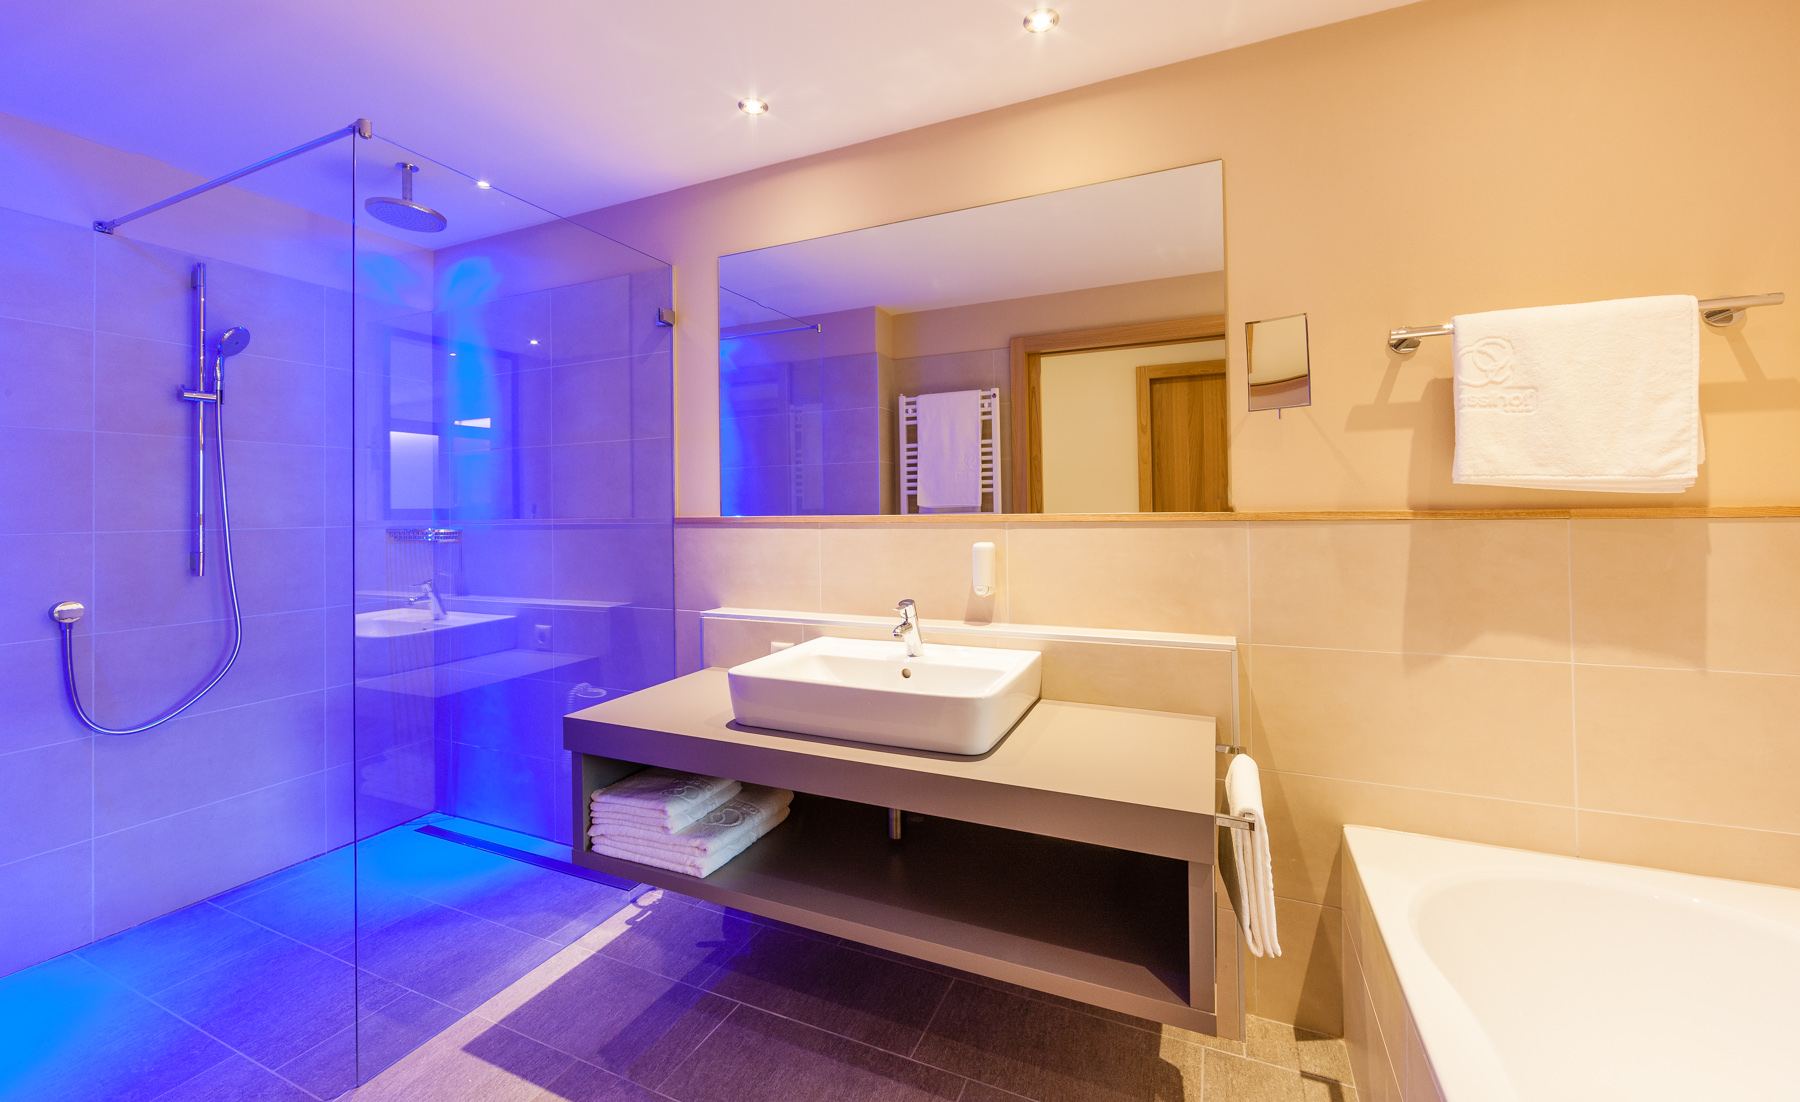 suiten im hotel hasslhof hotel hasslhof weinhotel am kalterer see. Black Bedroom Furniture Sets. Home Design Ideas